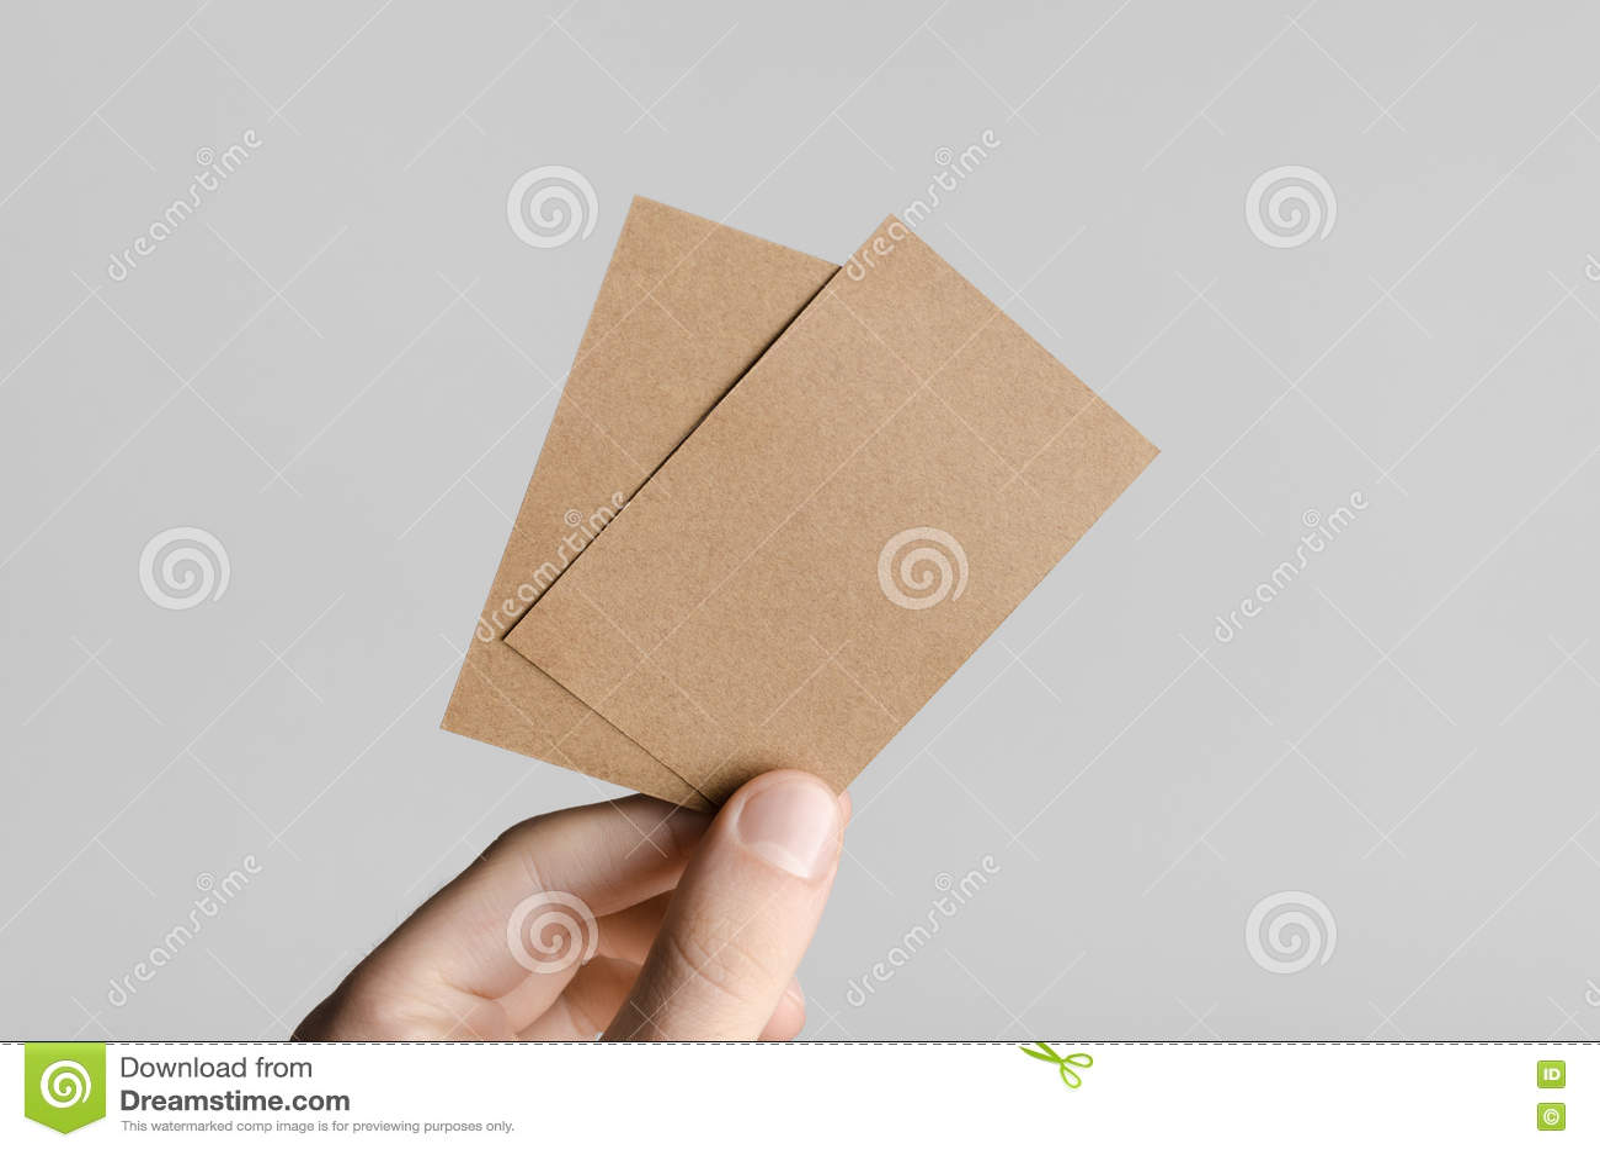 Kraftpapier Visitenkarte Modell 85x55mm Stockfoto Bild